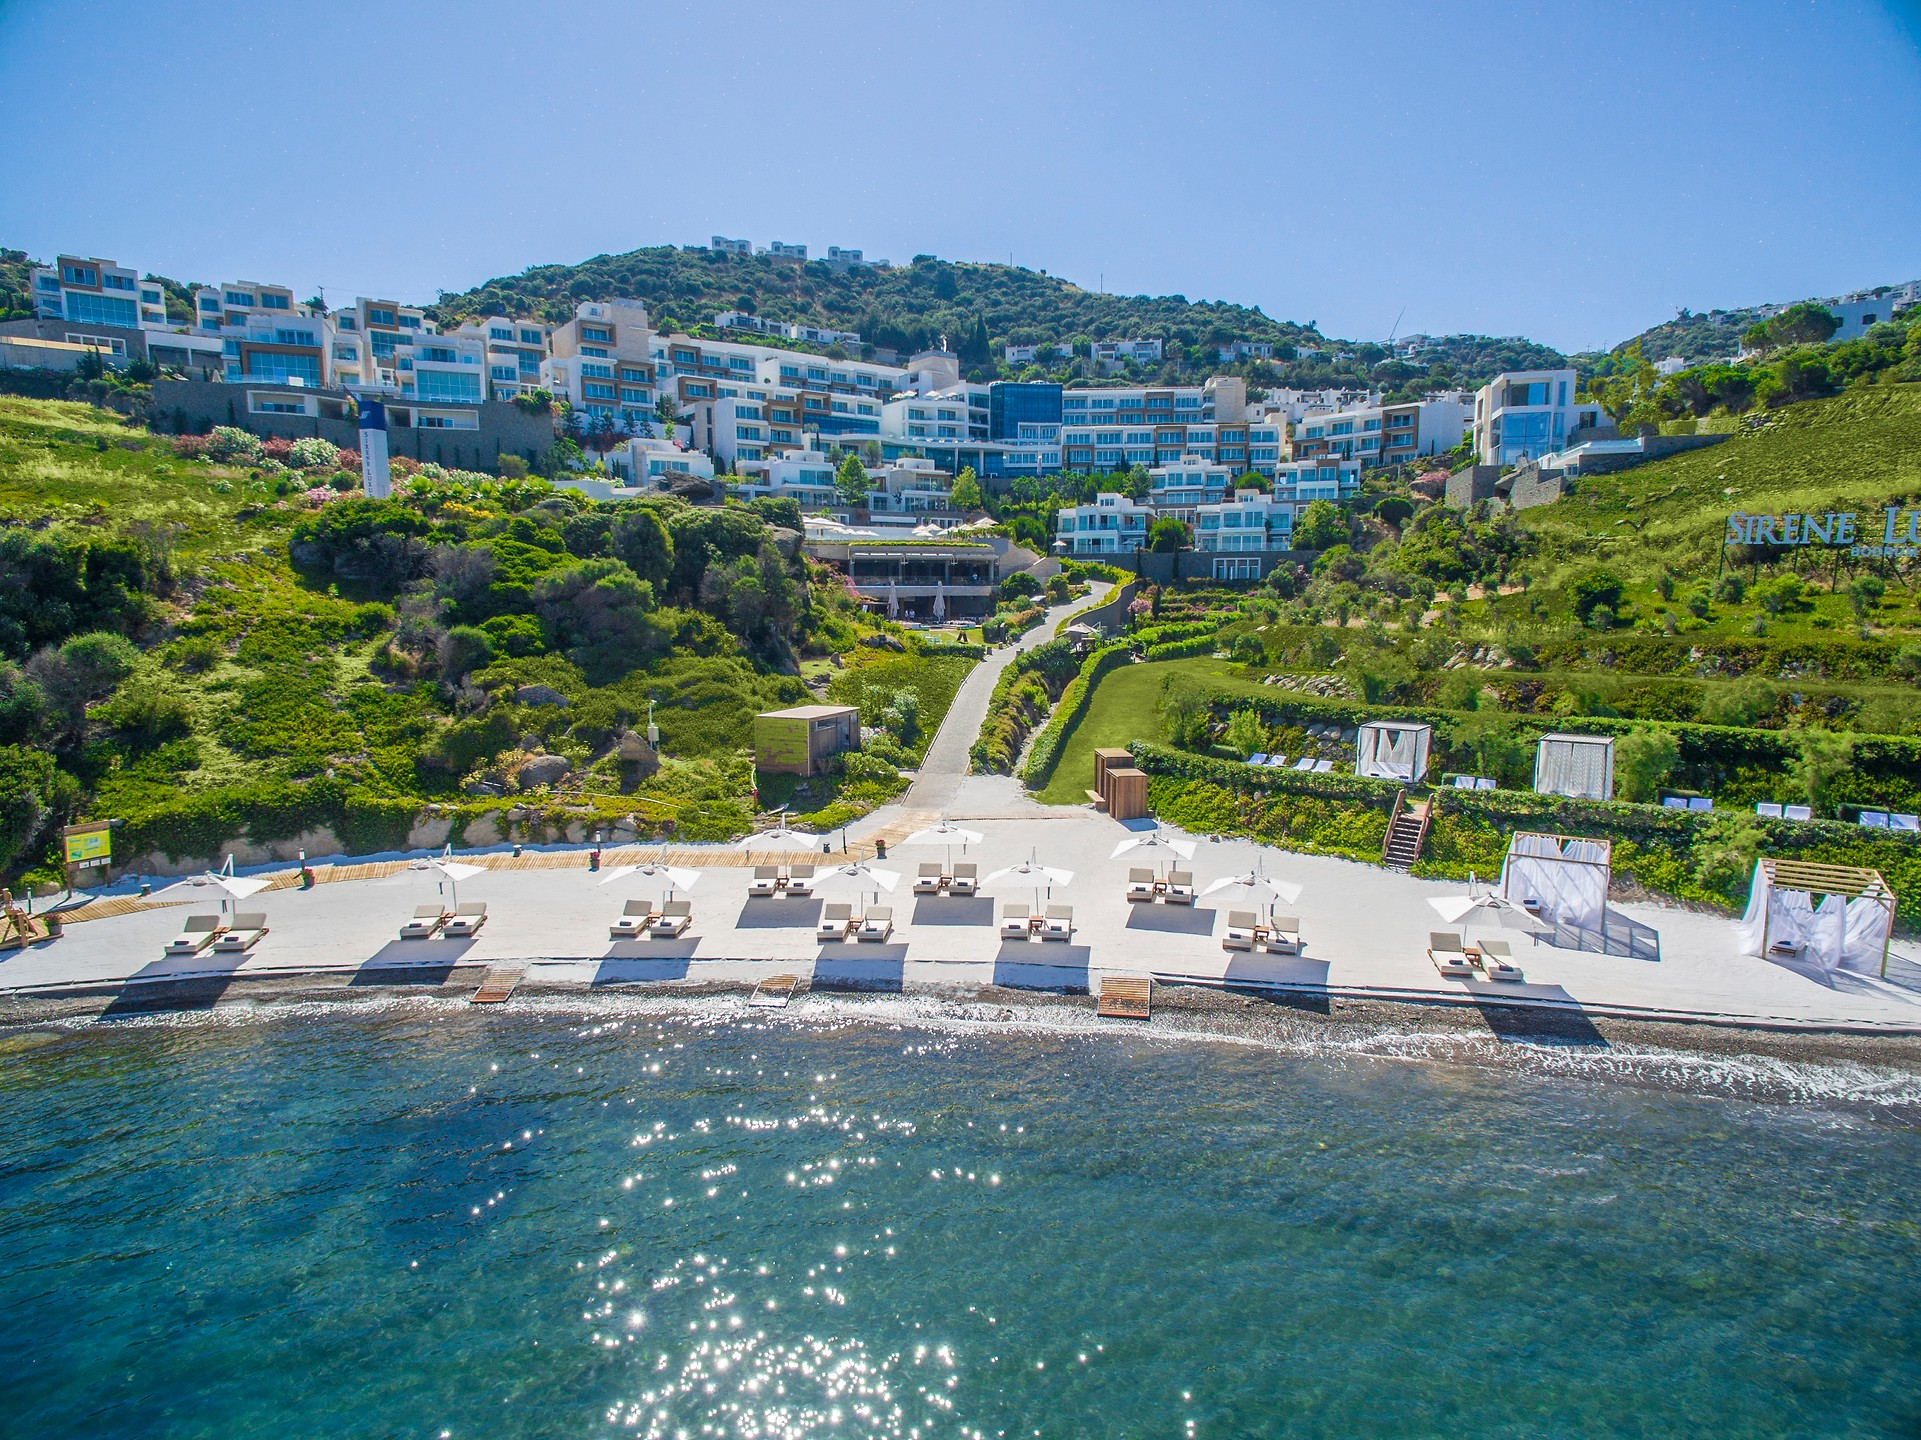 Sirene-Luxury-Hotel-Bodrum-Genel-282465